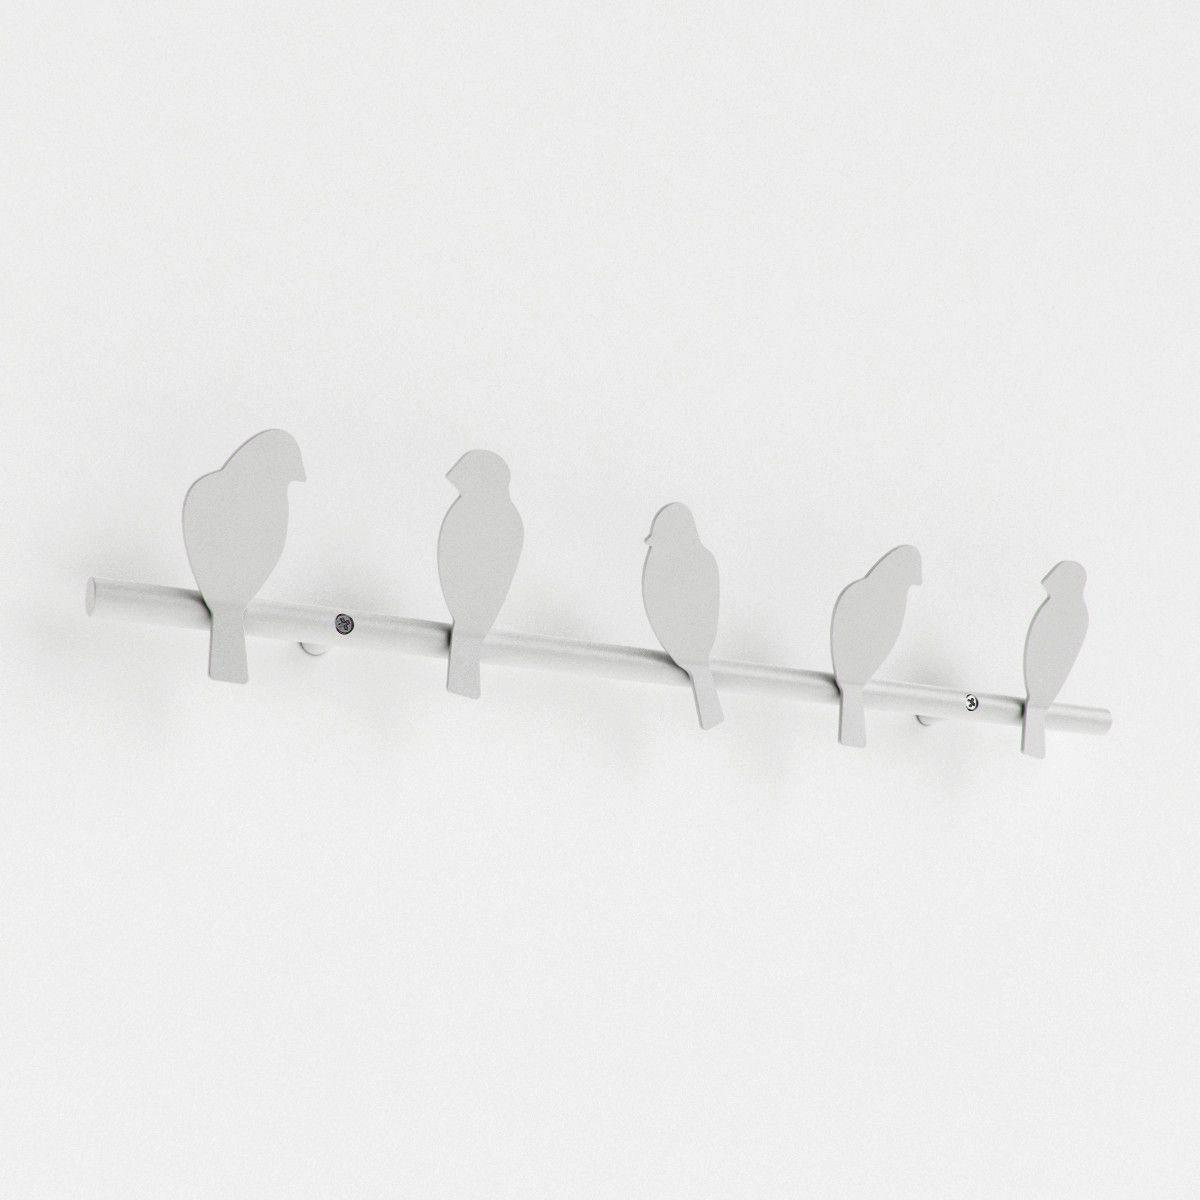 Wire Coat Hanger White   Home decoration ideas Interior design ...